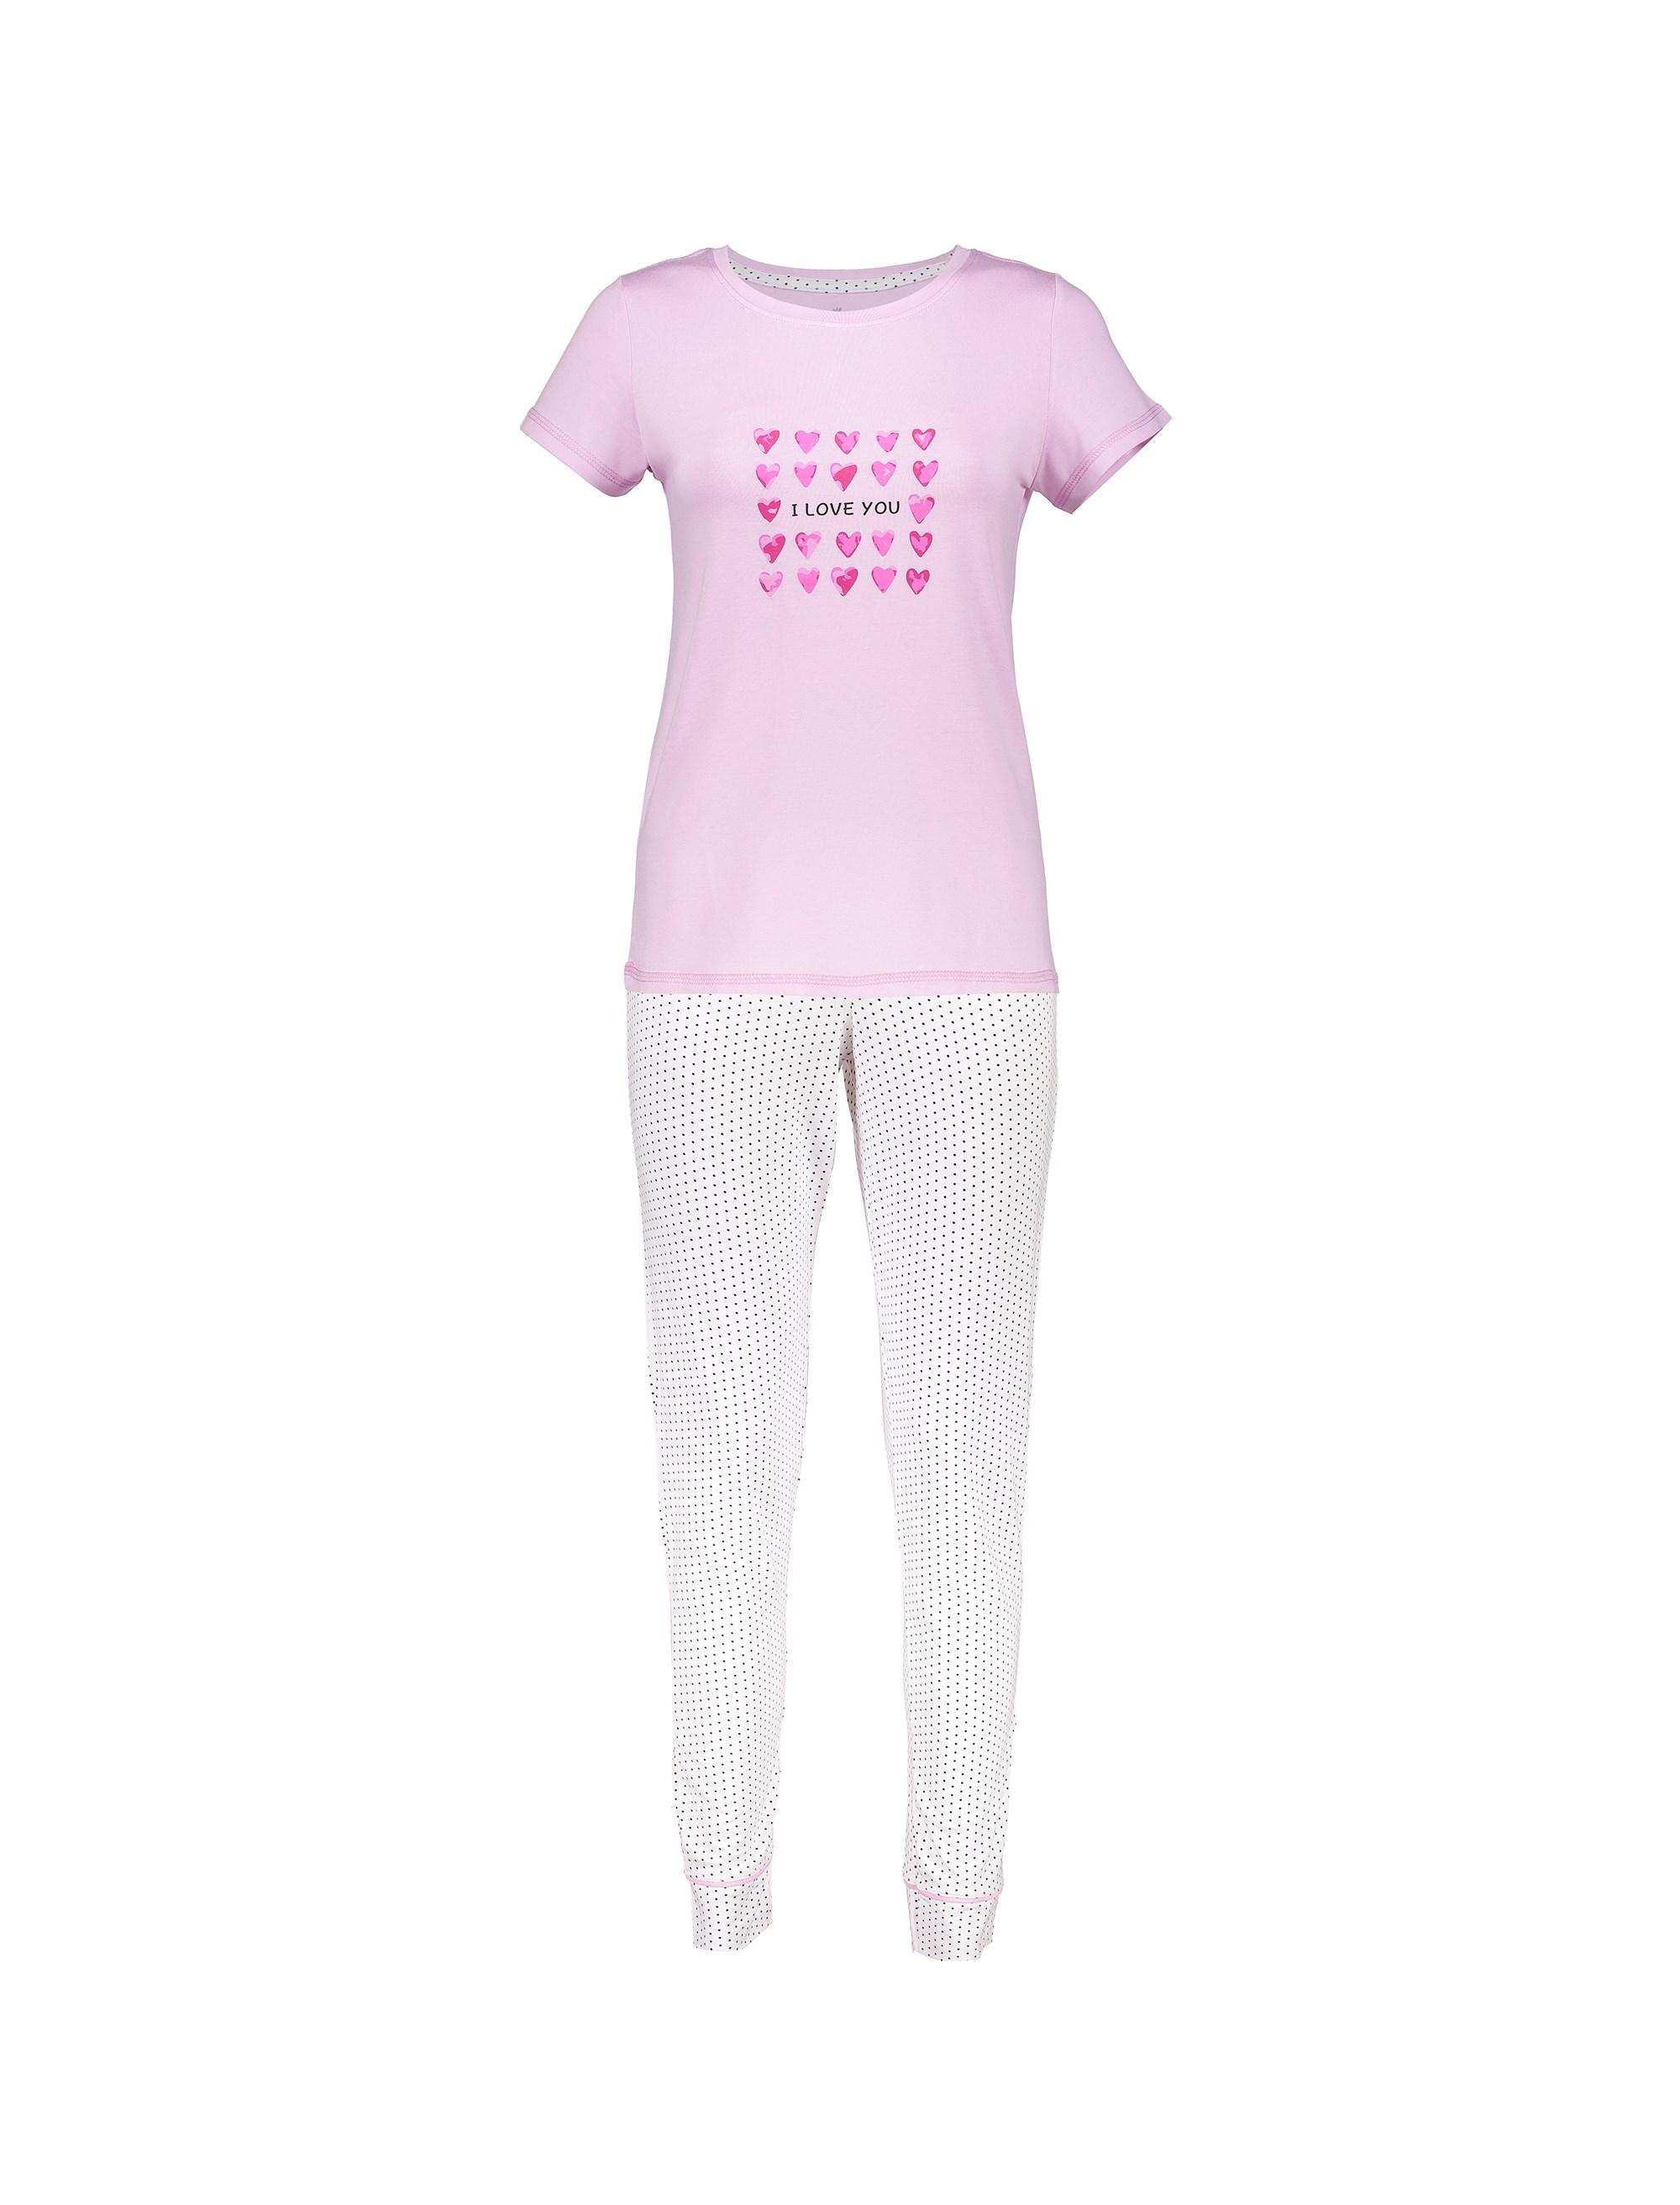 تی شرت و شلوار ویسکوز زنانه - صورتي - 1